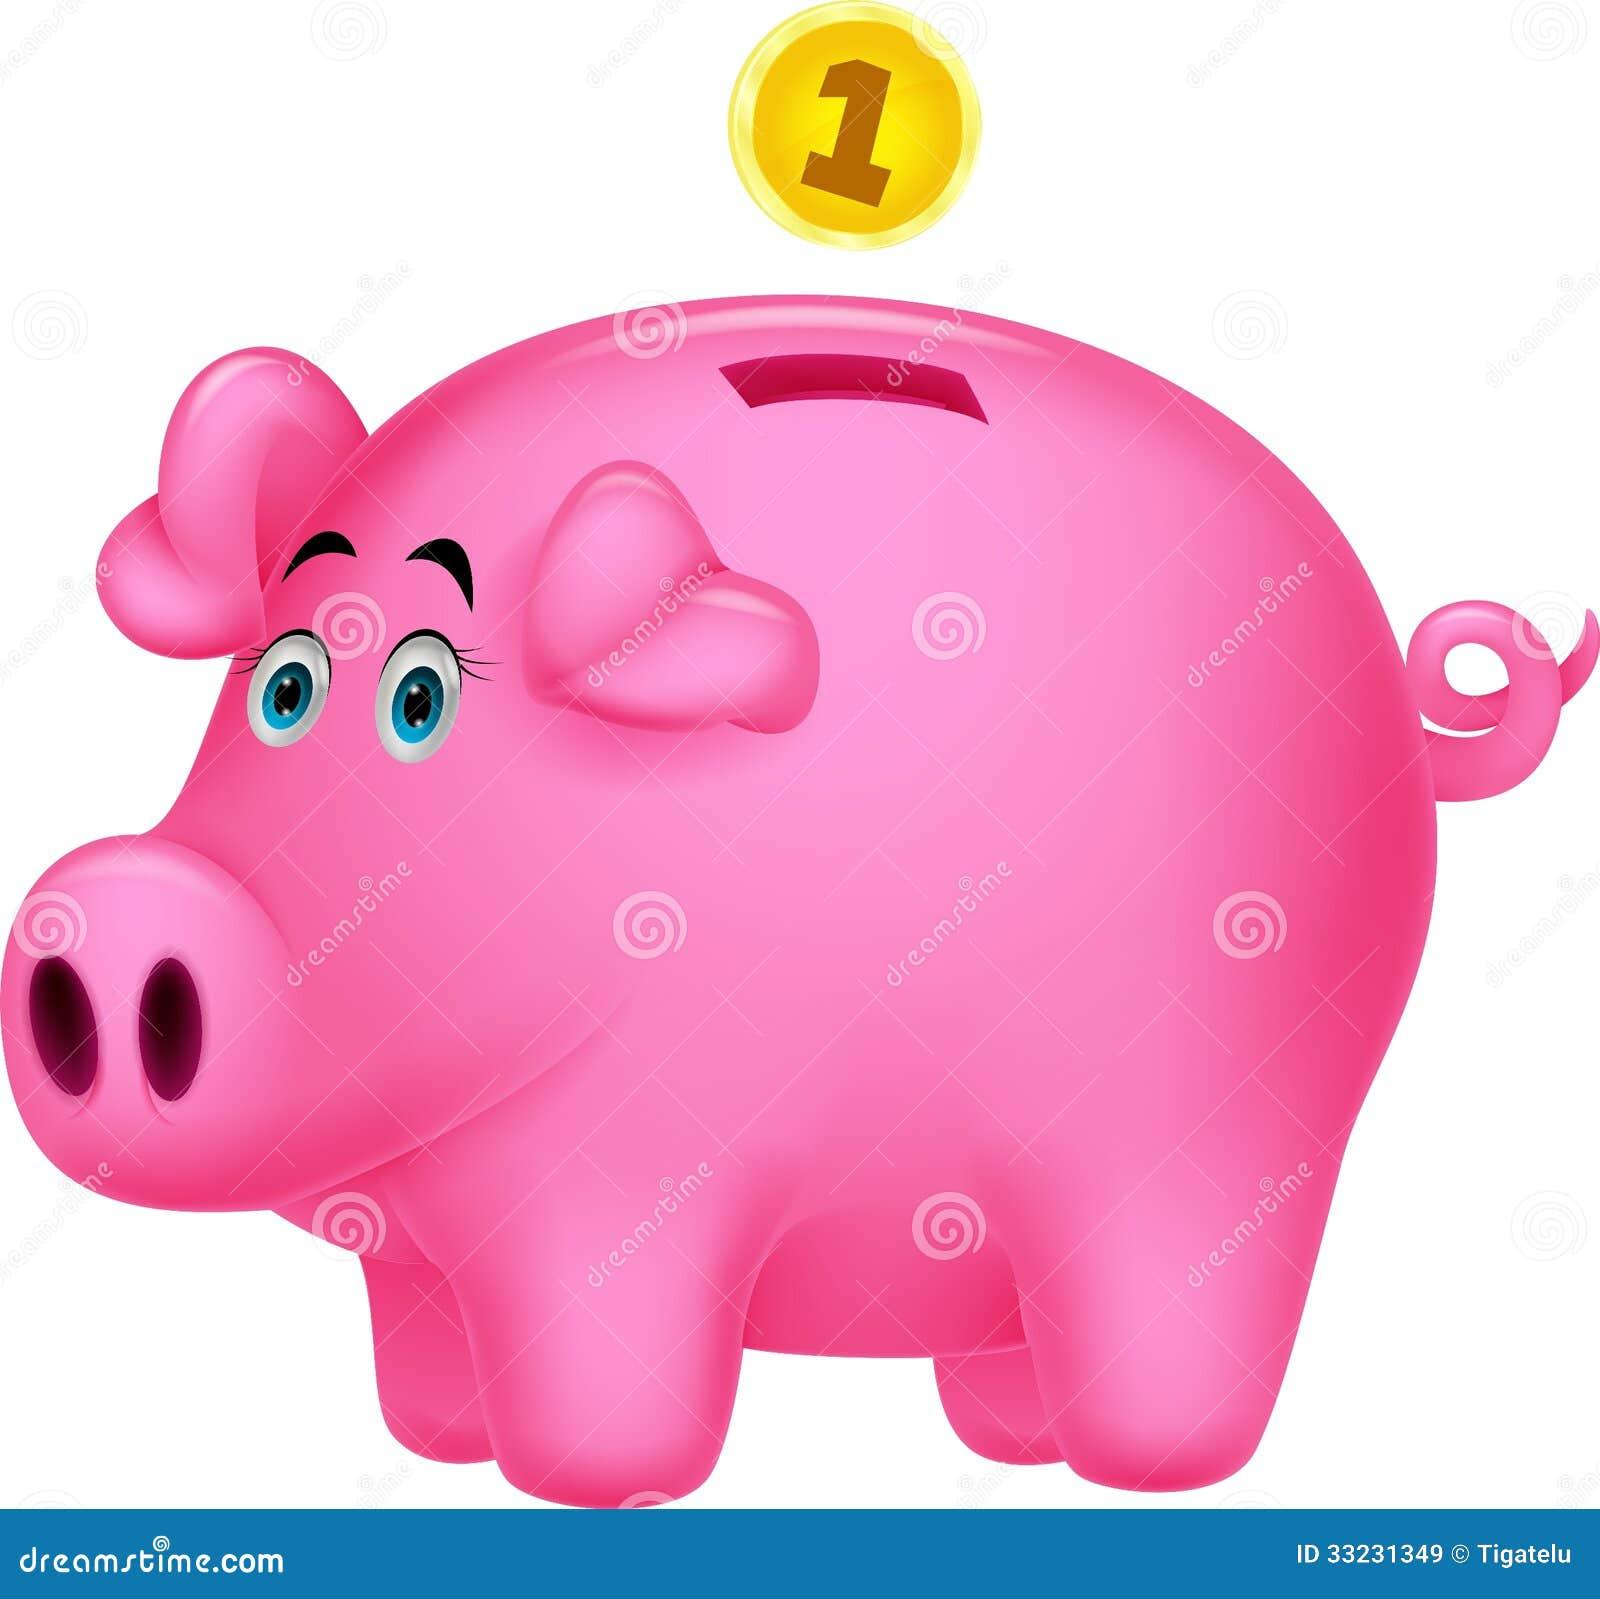 Piggy Bank Cartoon Stock Vector. Image Of Mascot, Keep